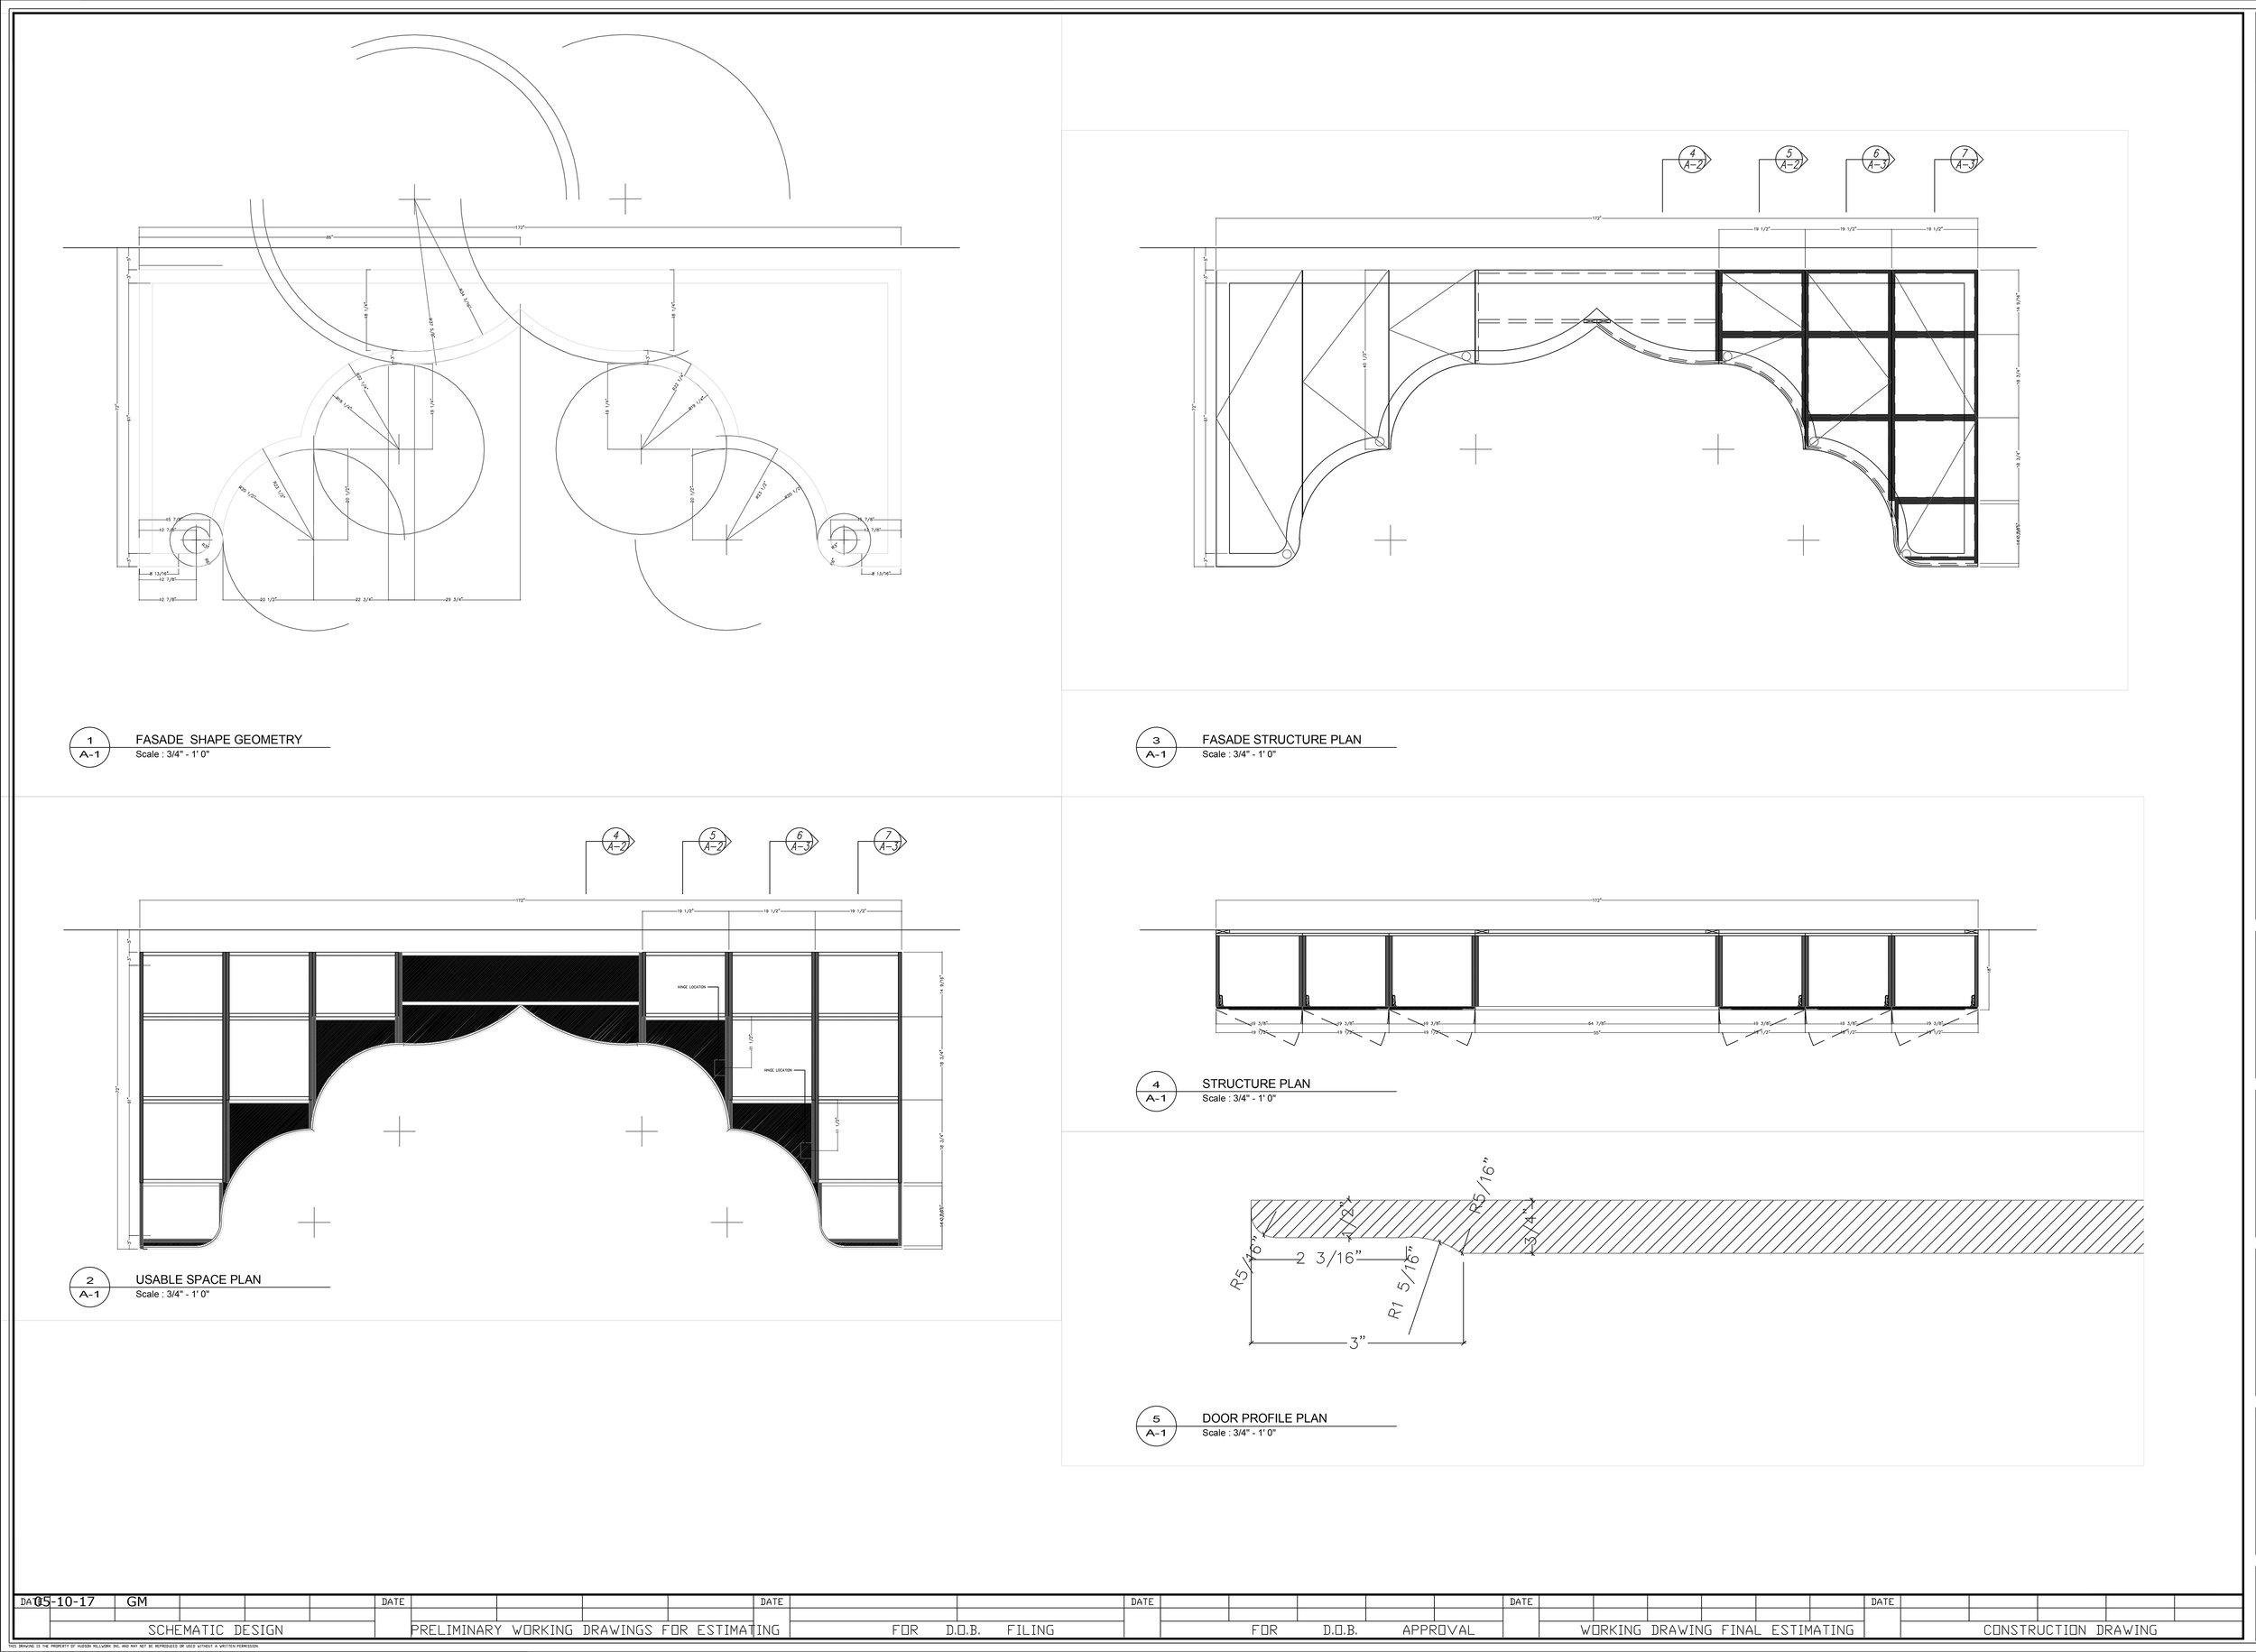 Helenas-bed-cabinetry1.jpg